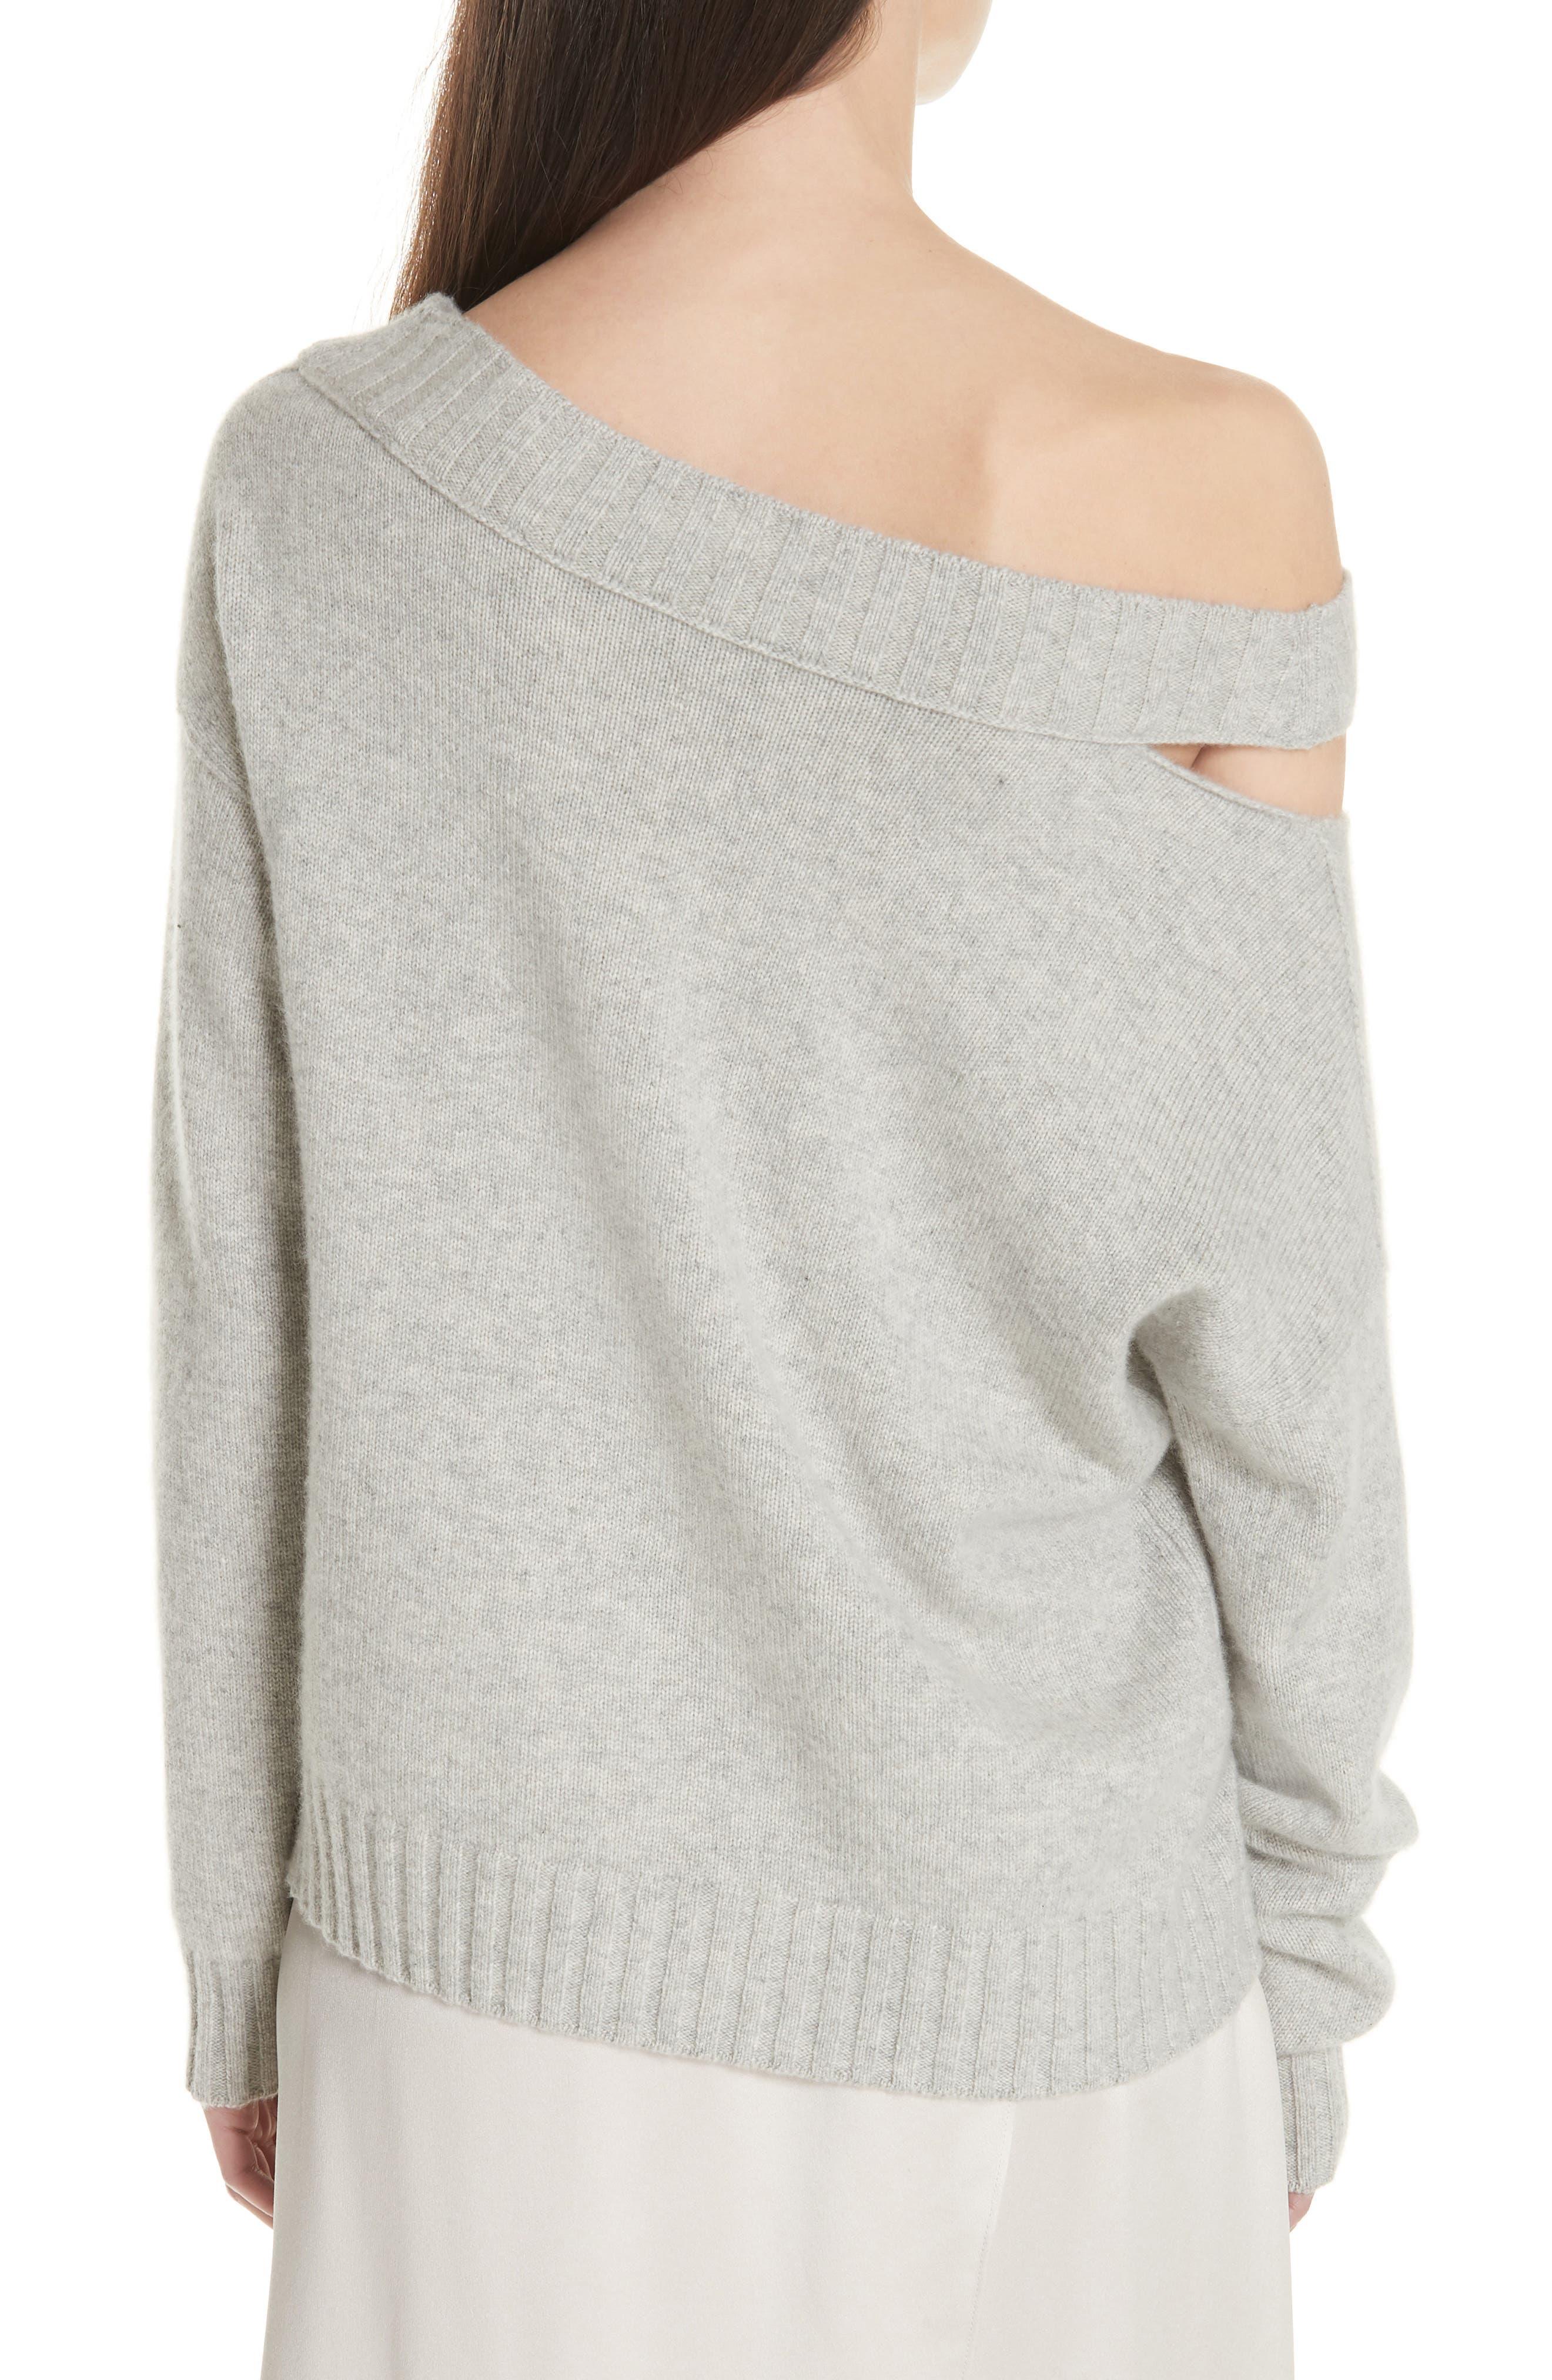 One Shoulder Slit Pullover Sweater,                             Alternate thumbnail 2, color,                             LIGHT HEATHER GREY